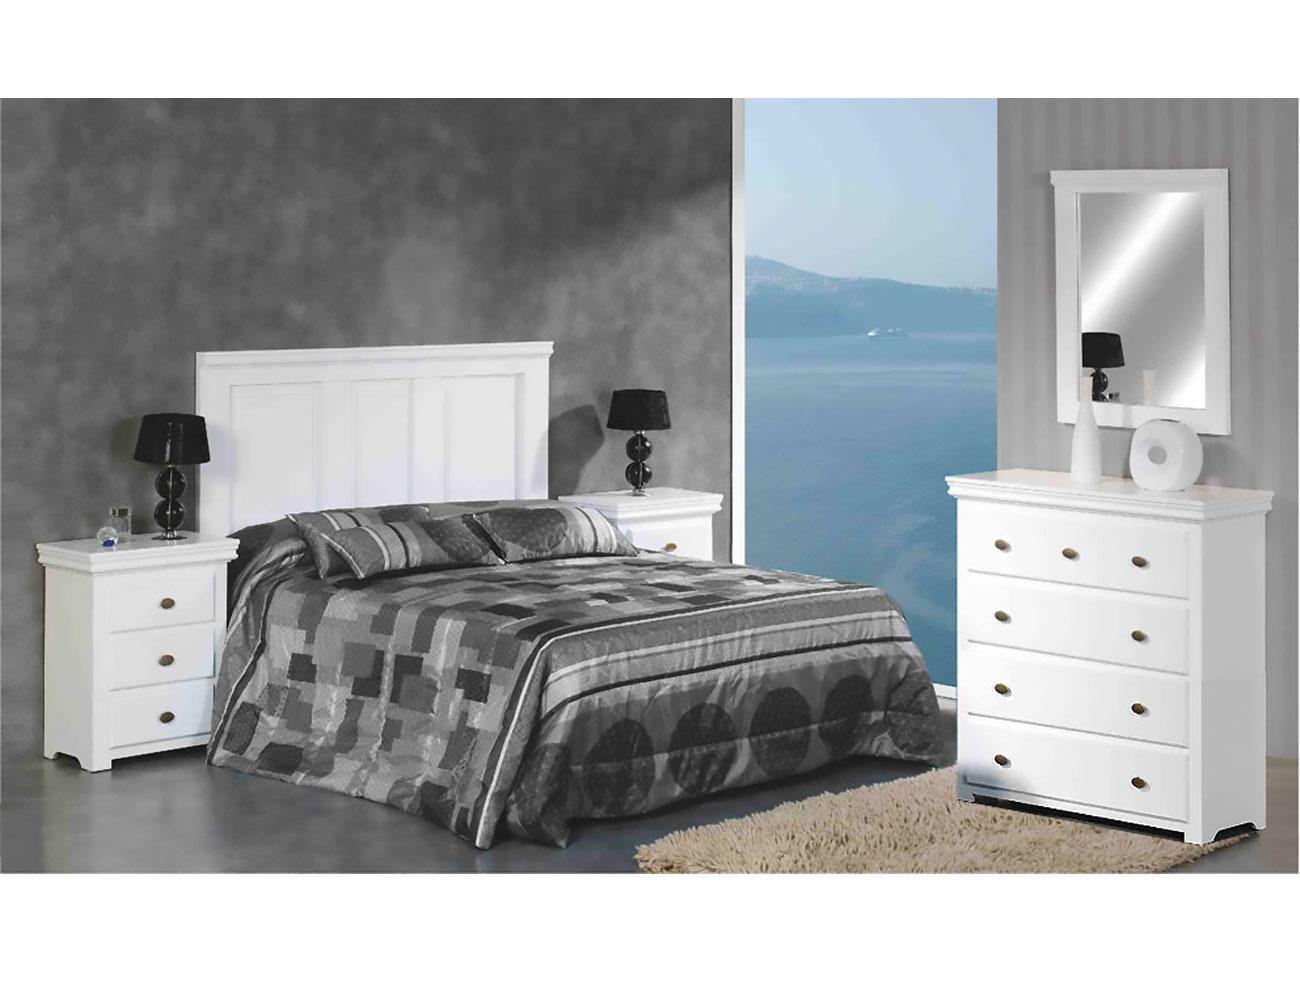 Dormitorio matrimonio comoda 5 c madera dm lacado blanco7